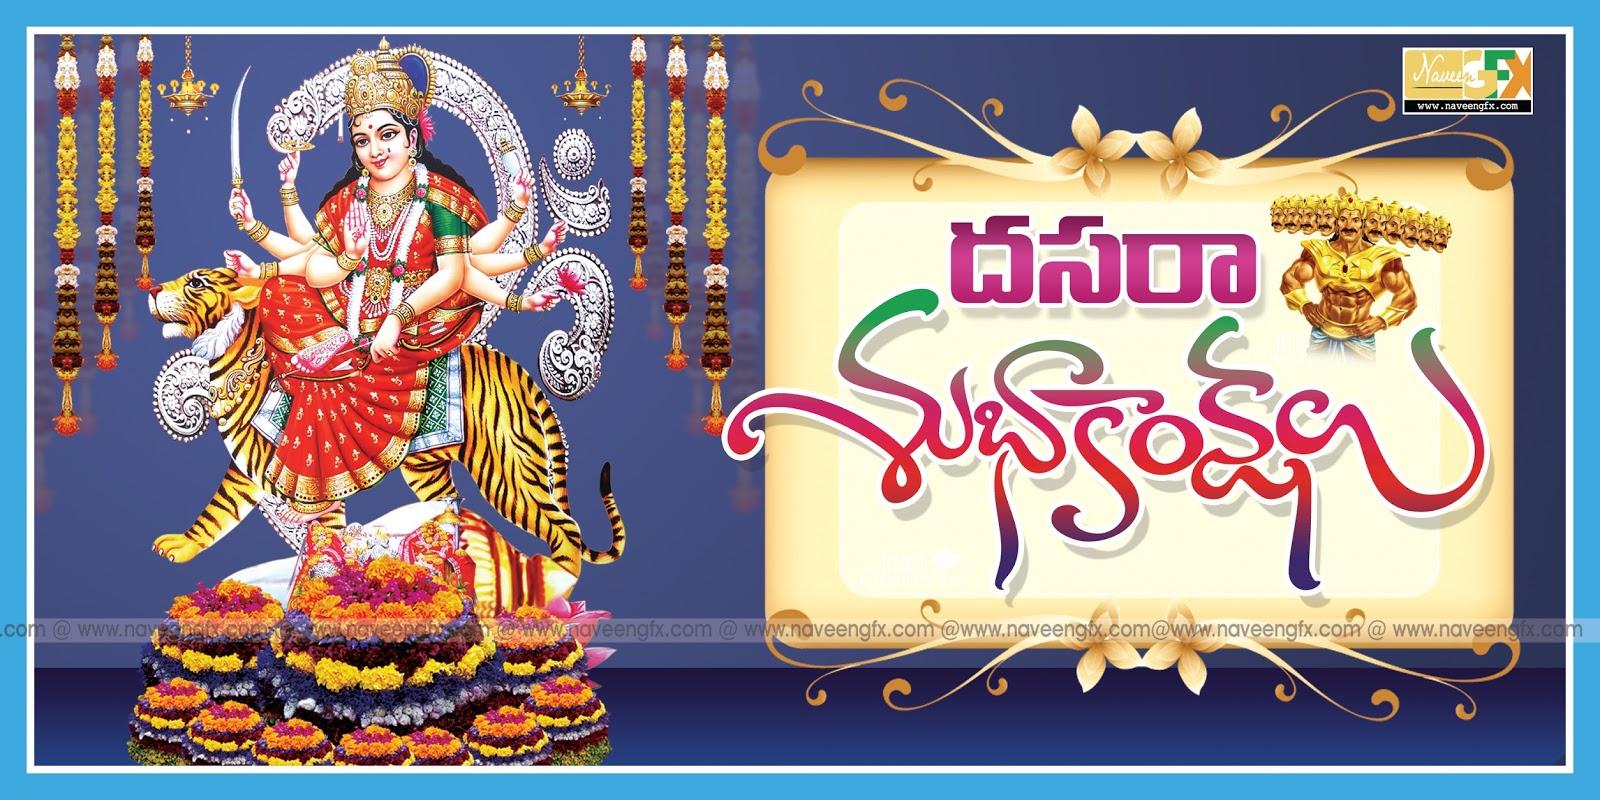 Happy dussehra dasara nice telugu quotes and wishes naveengfx happy vijaya dashami durga pooja telugu greetings and quotes hd for facebook m4hsunfo